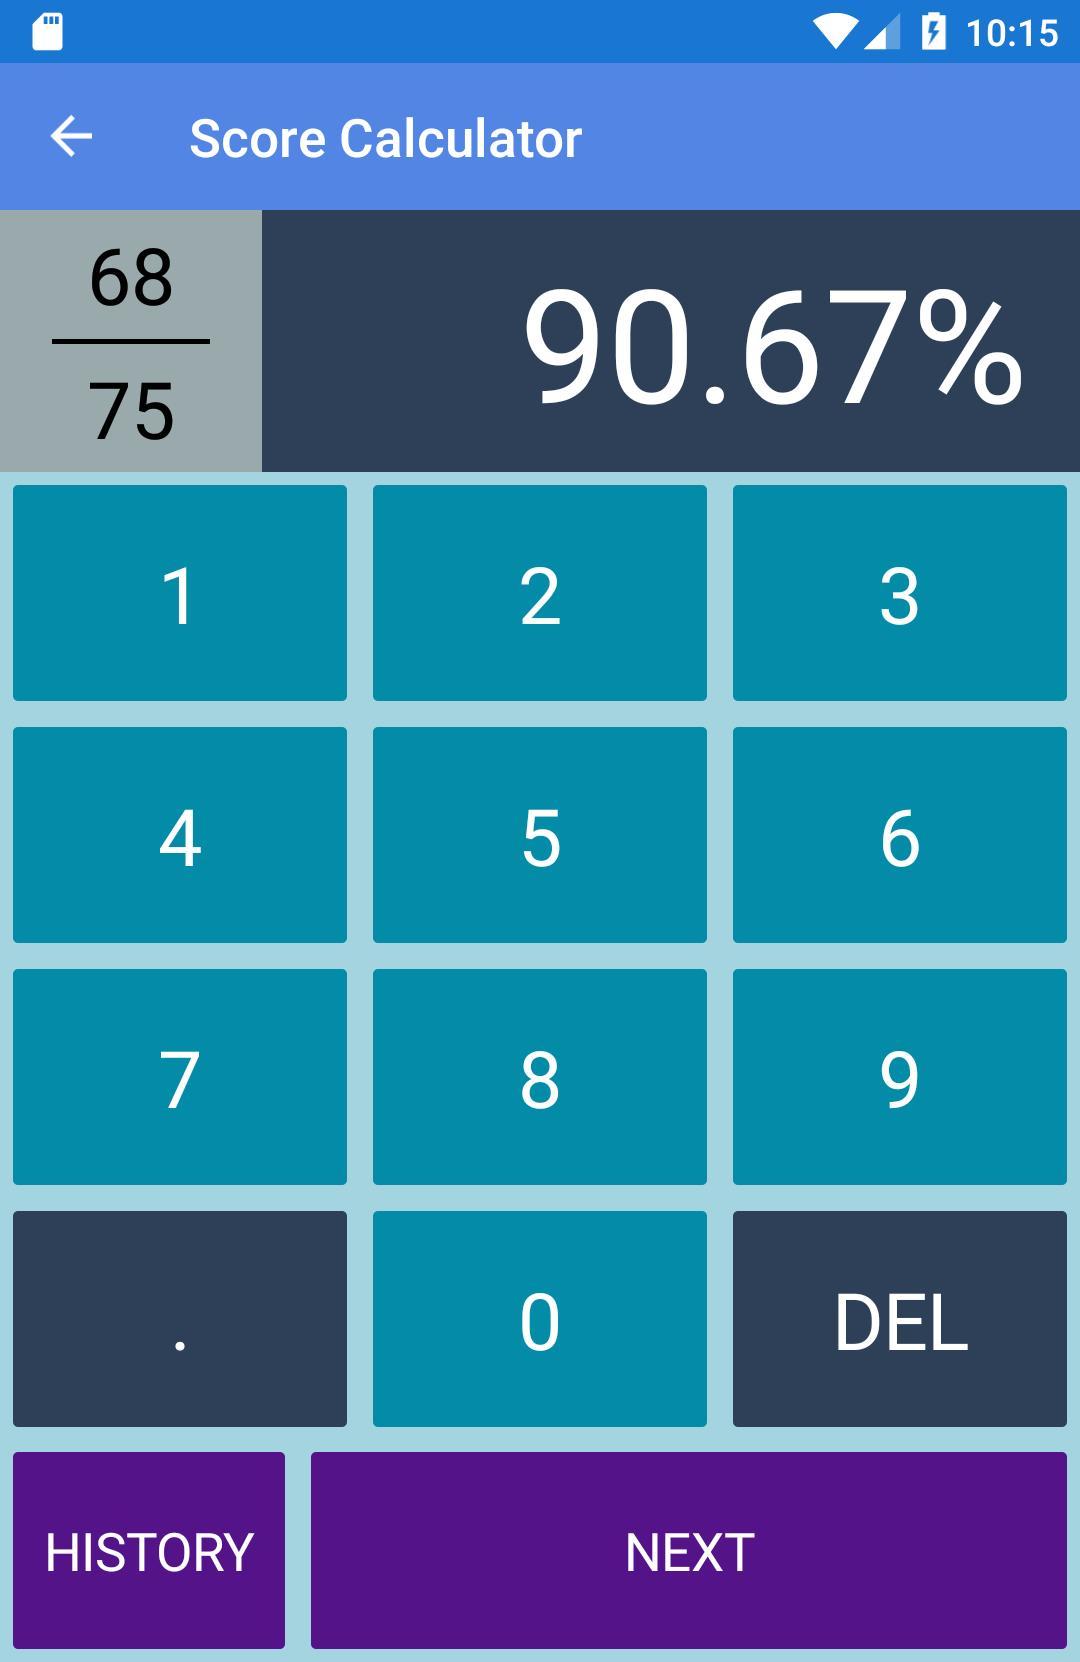 Easy Grader - Grading Calculator and Test Tracker for